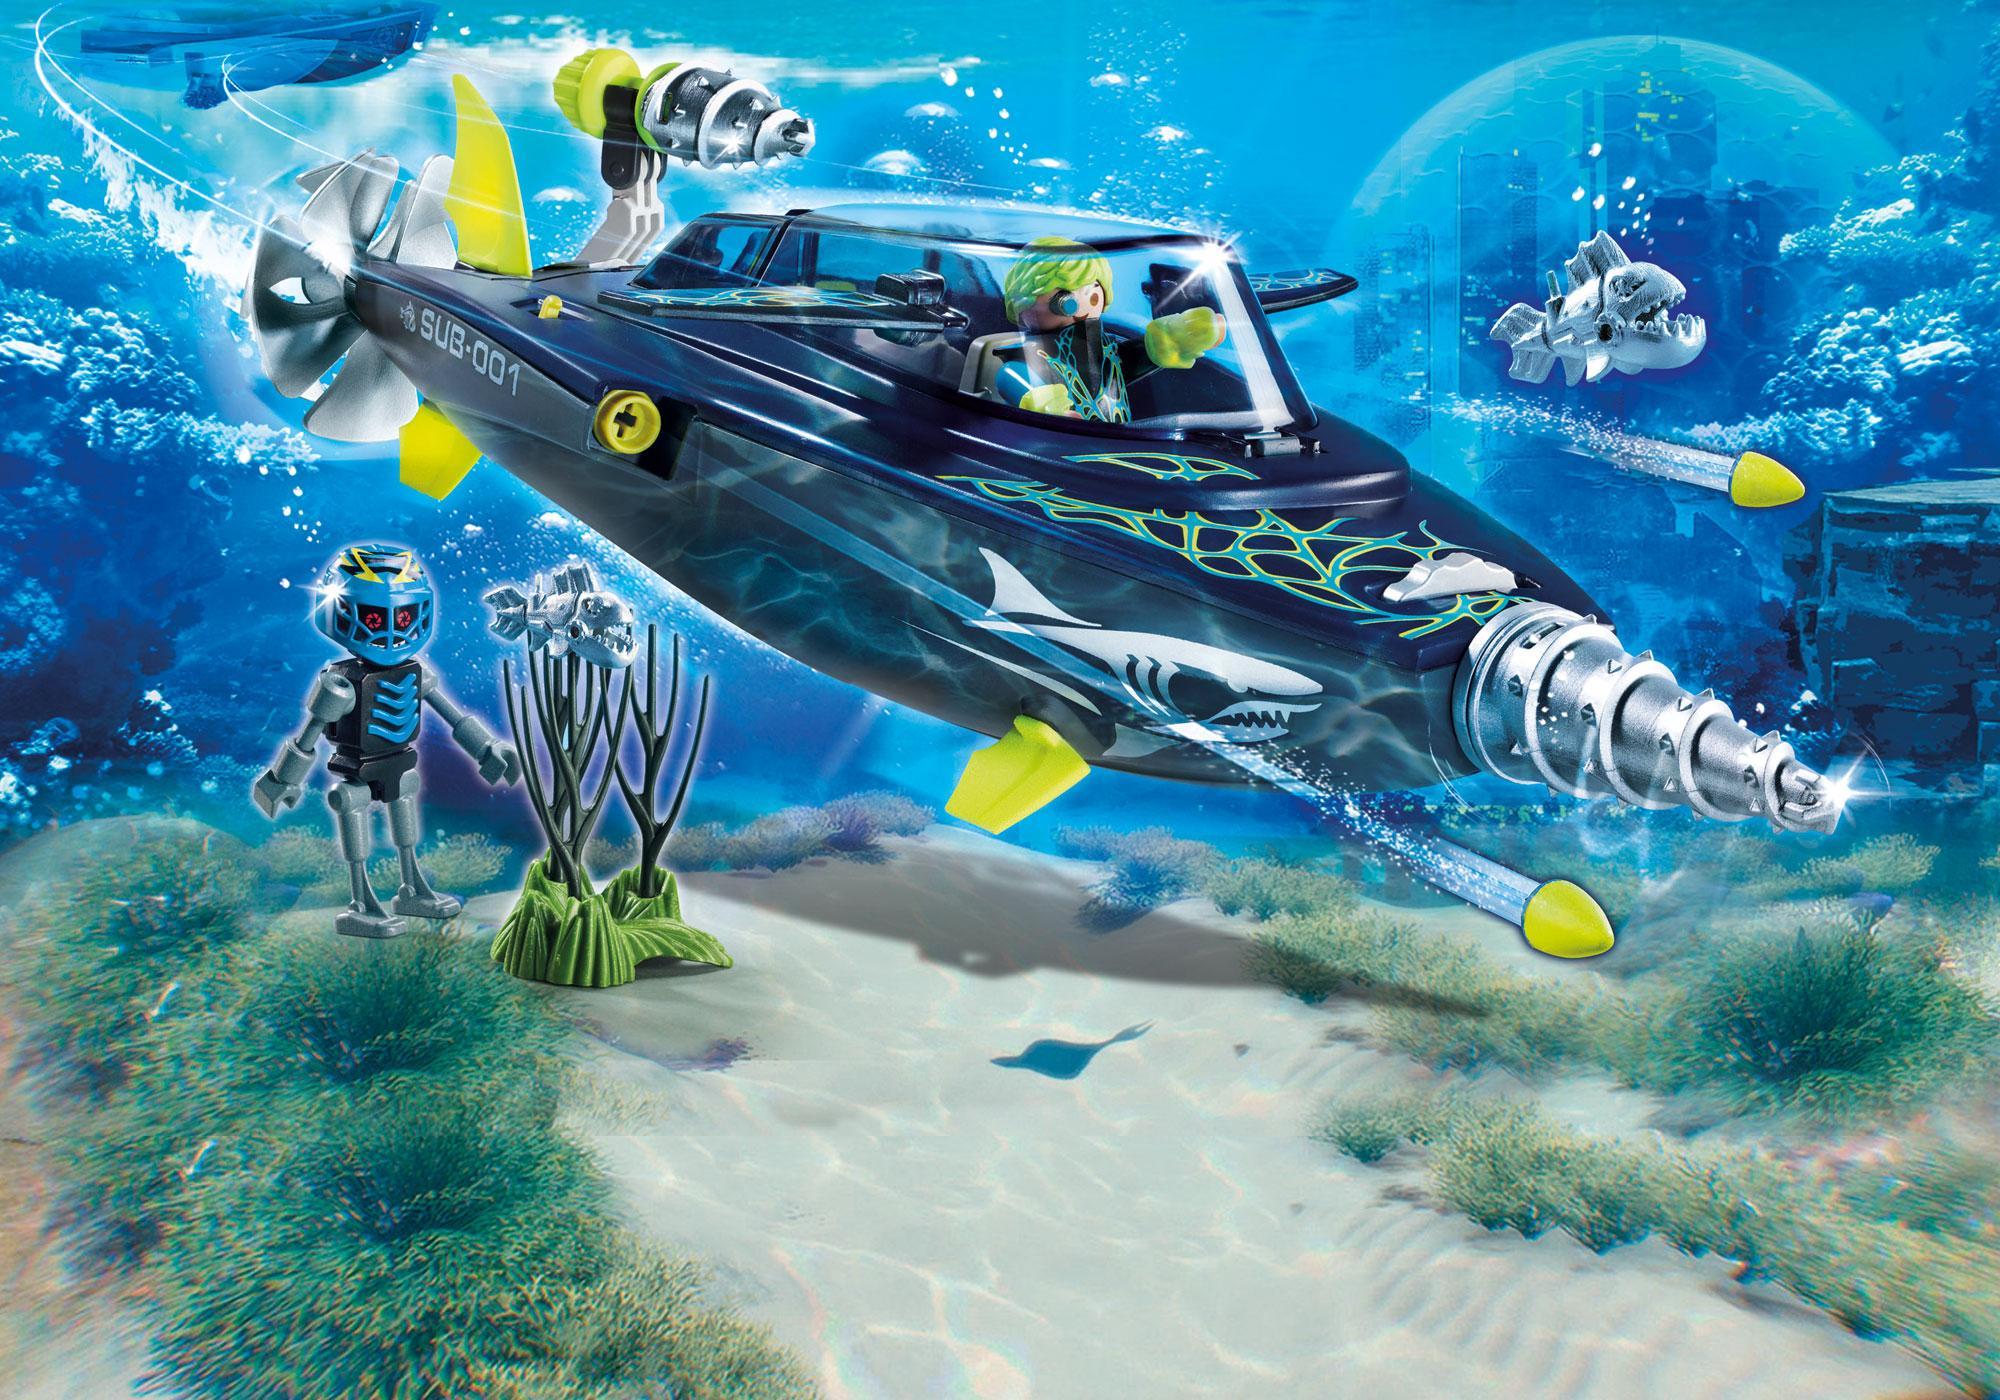 70005_product_detail/Sottomarino da assalto del Team S.H.A.R.K.